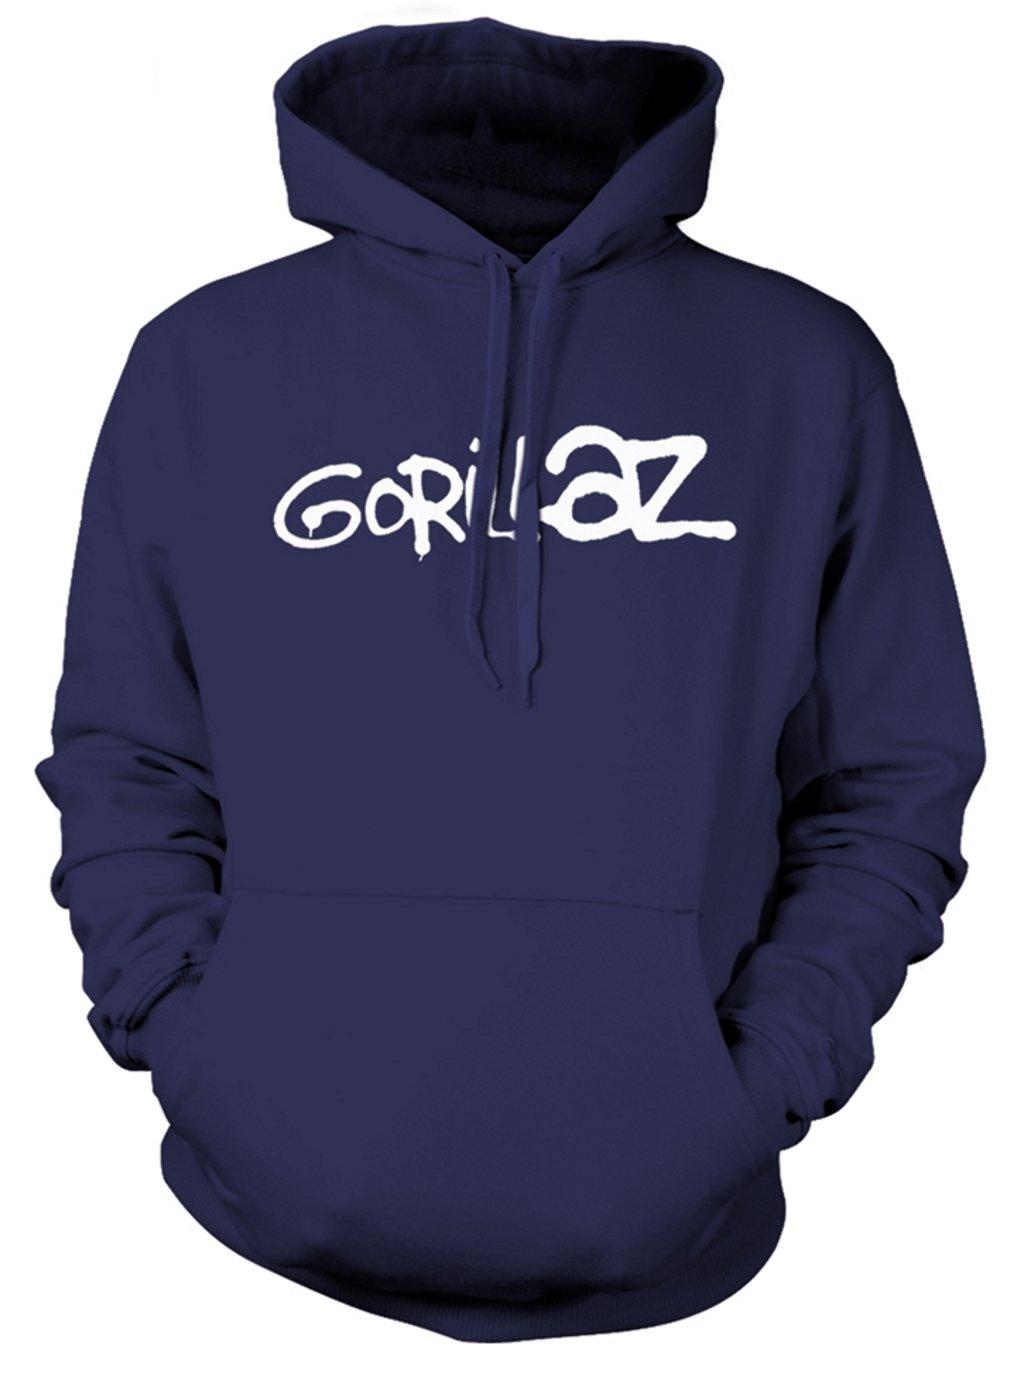 Gorillaz Logo Blue Pull Over 8539 Shirts